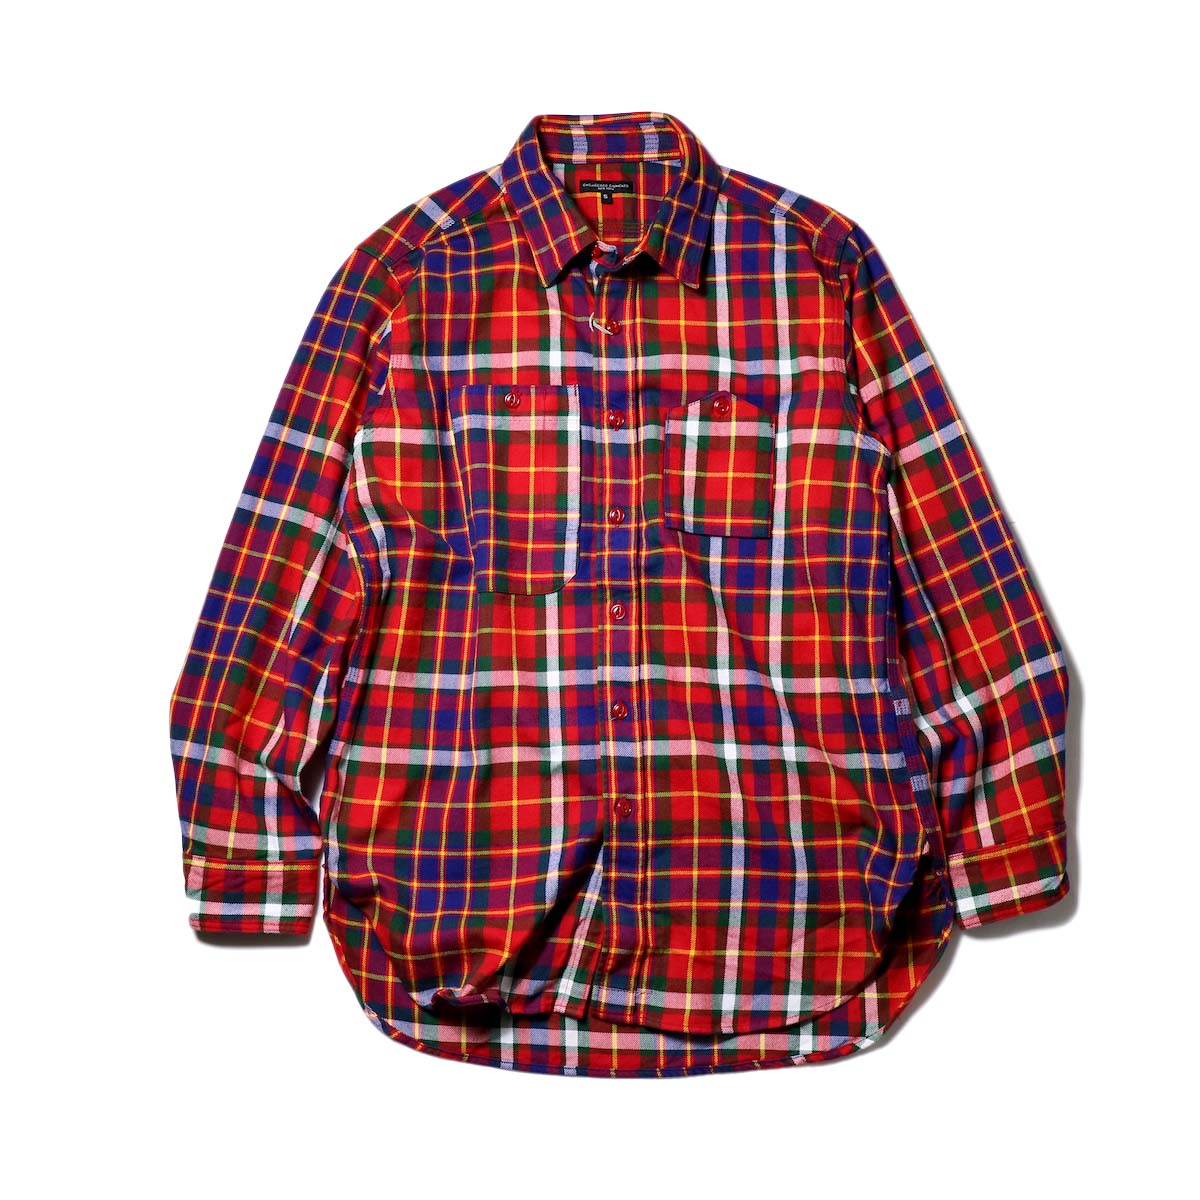 Engineered Garments / Work Shirt-Twill Plaid (Red/Green/Yellow)